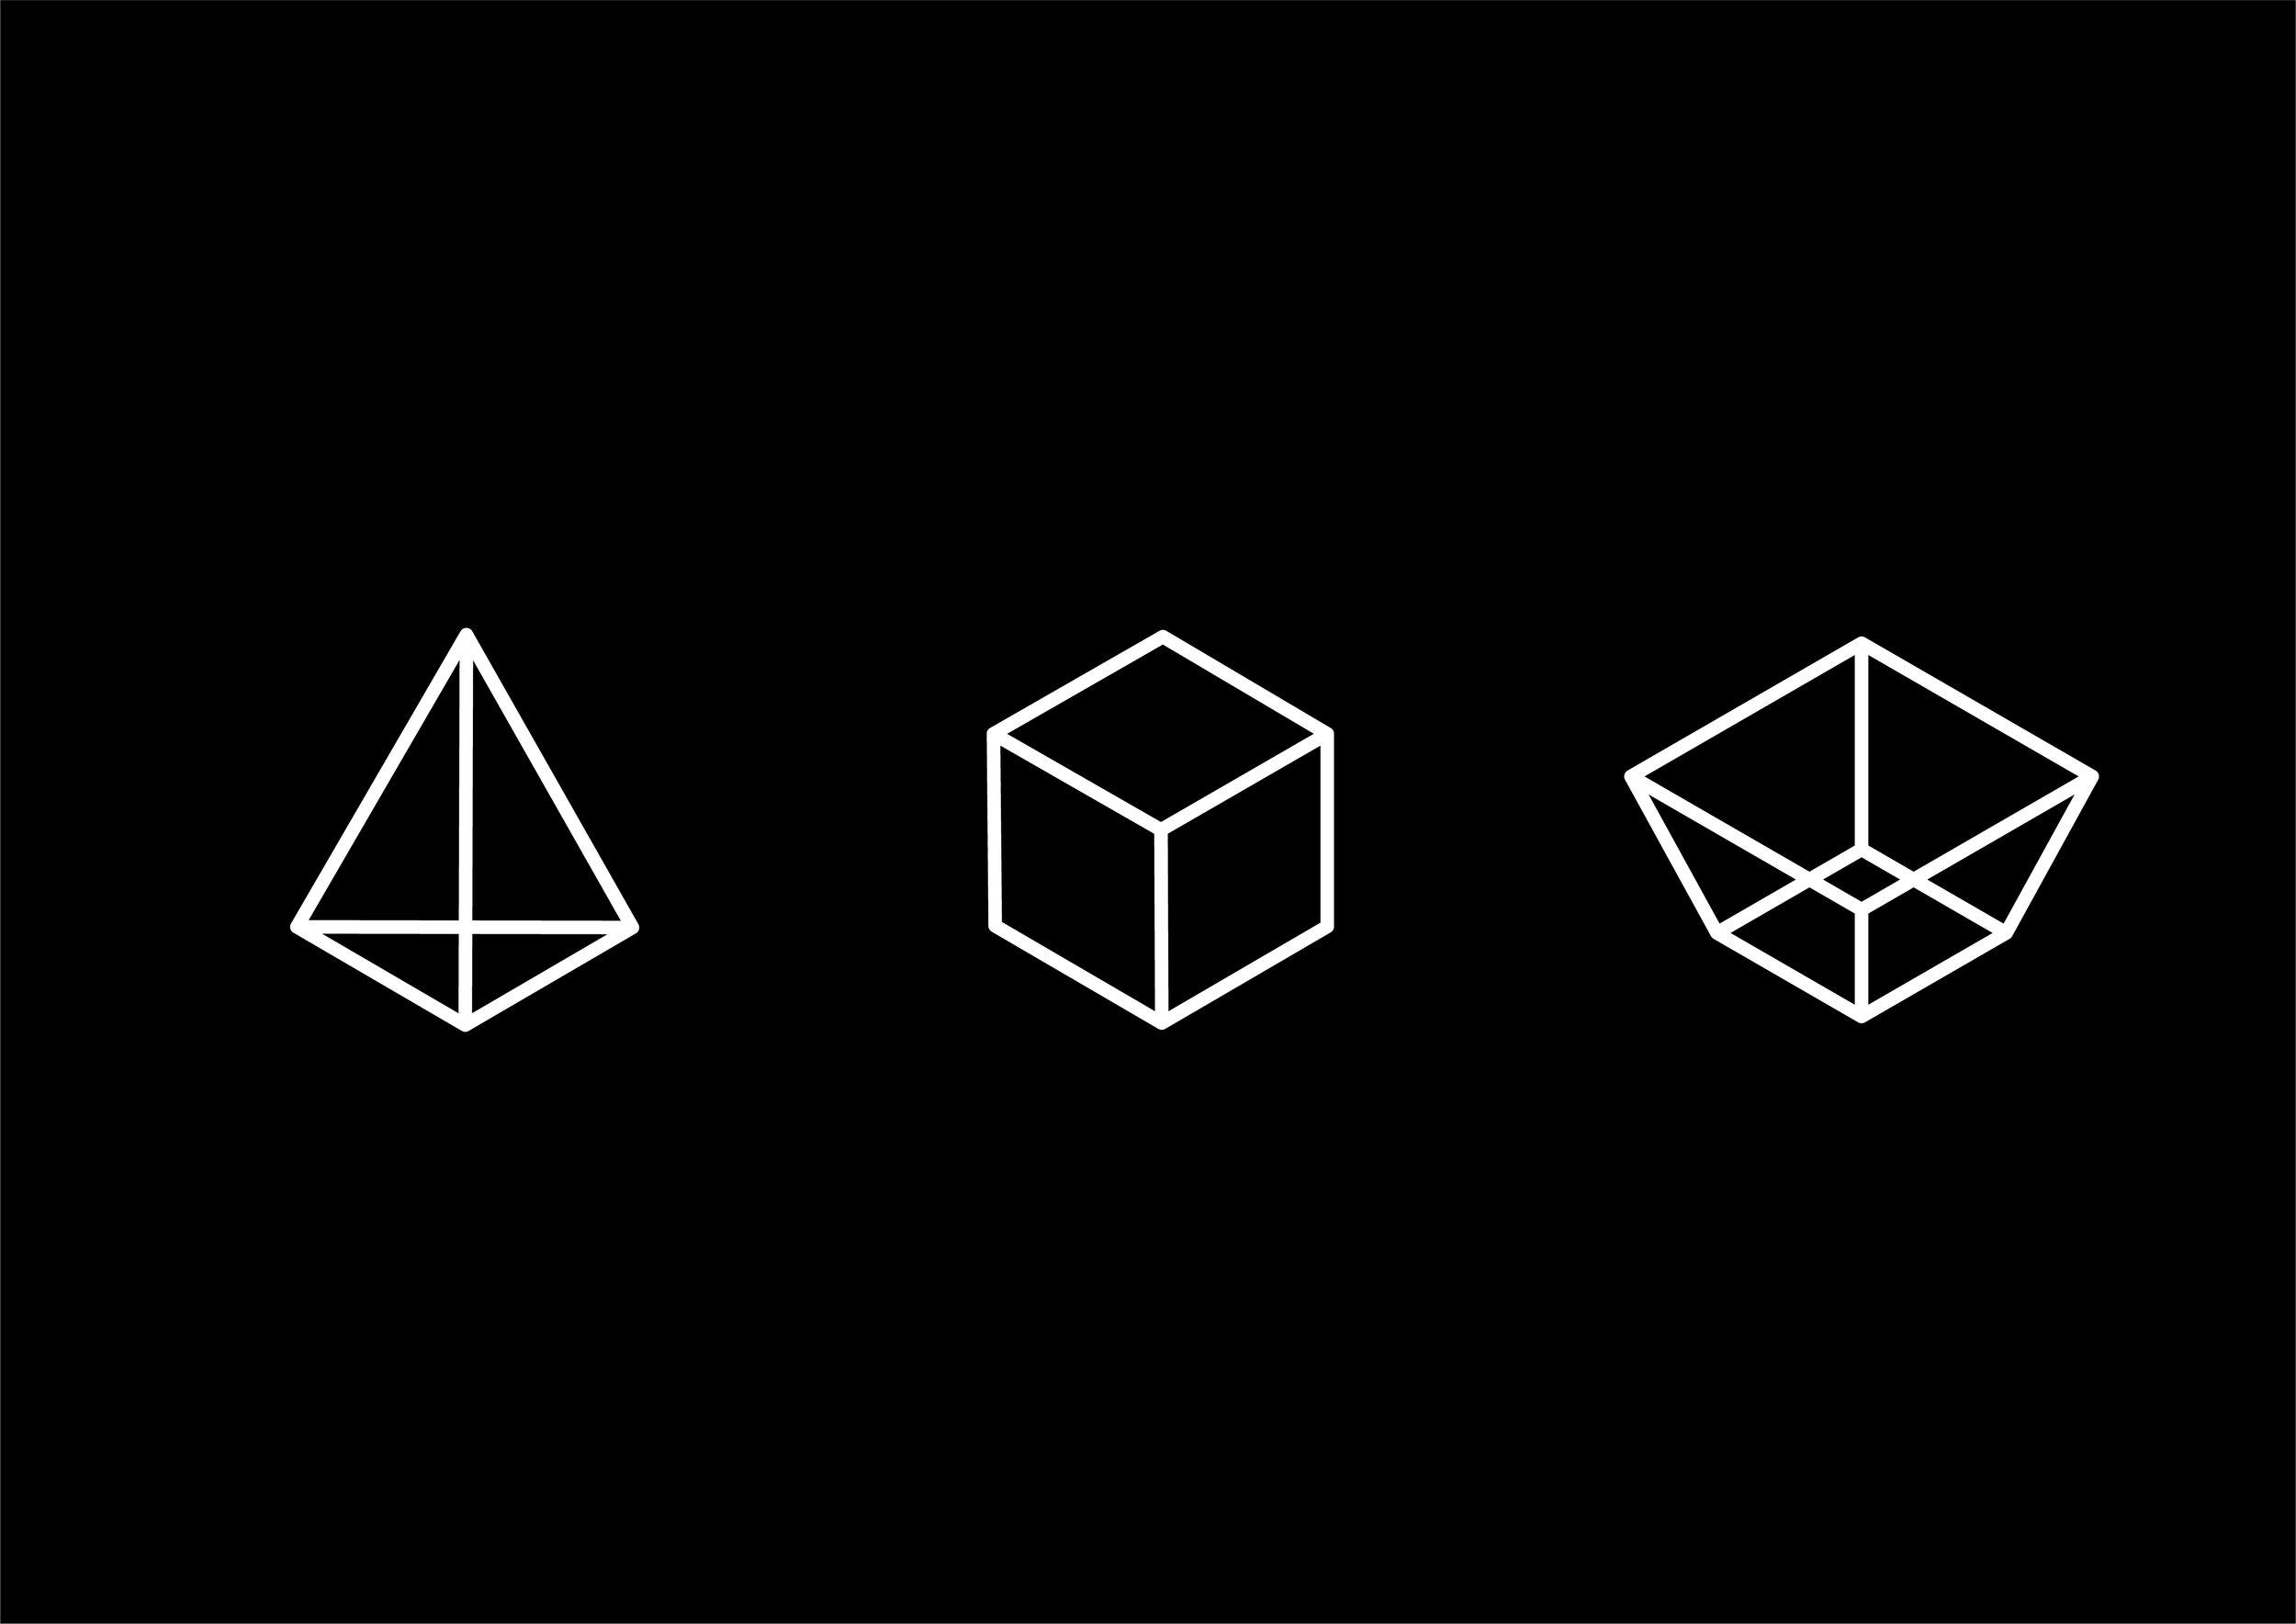 Lightbox geometry3-01.jpg